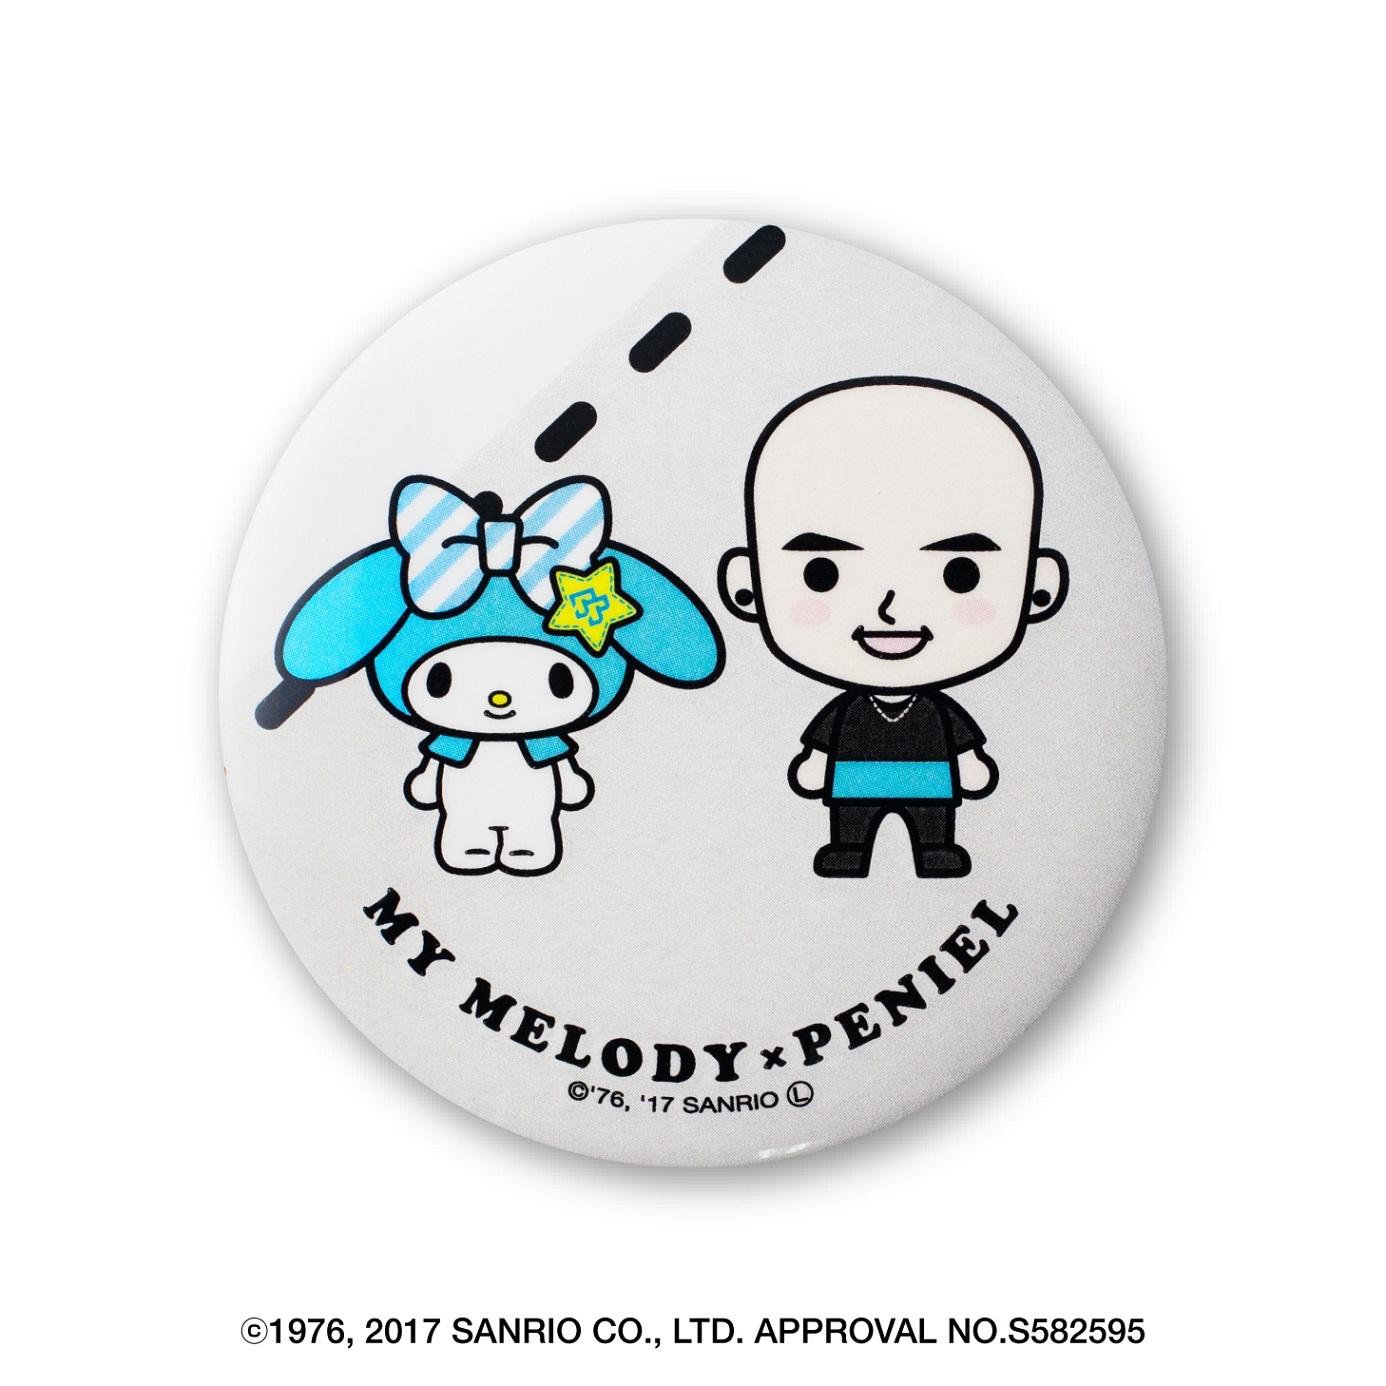 【BTOB × マイメロディ コラボグッズ第一弾】缶バッジ(全7種・ランダム)